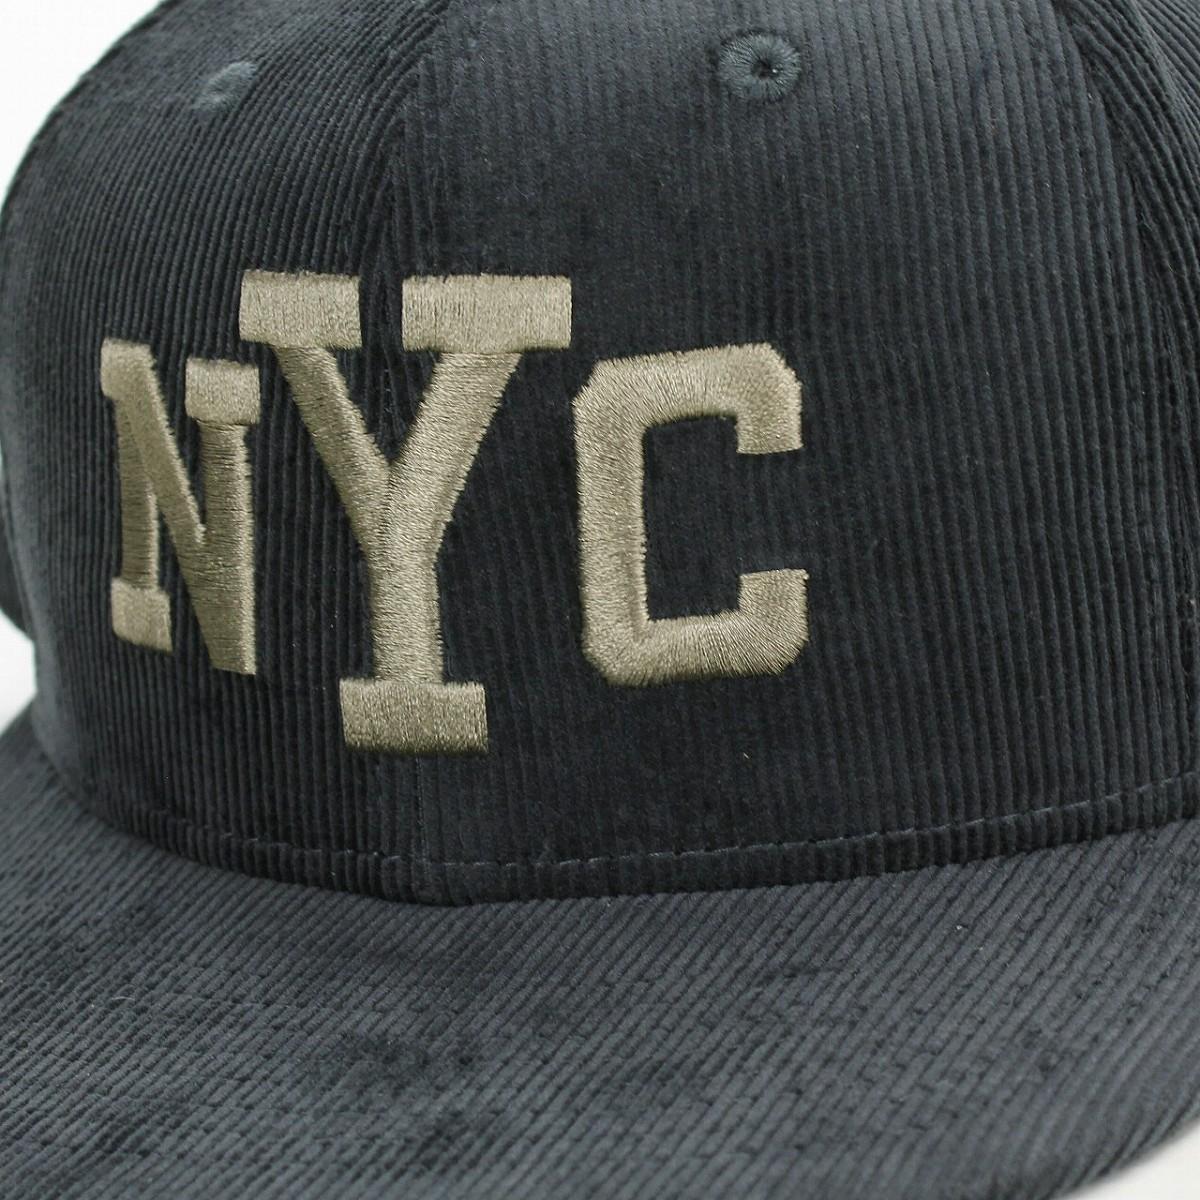 NEWERA cap corduroy new gills hat 9FIFTY TM NYC baseball cap men street  brand fashion charcoal gray  baseball cap  present man new gills hat mail  order c56b3c7793f